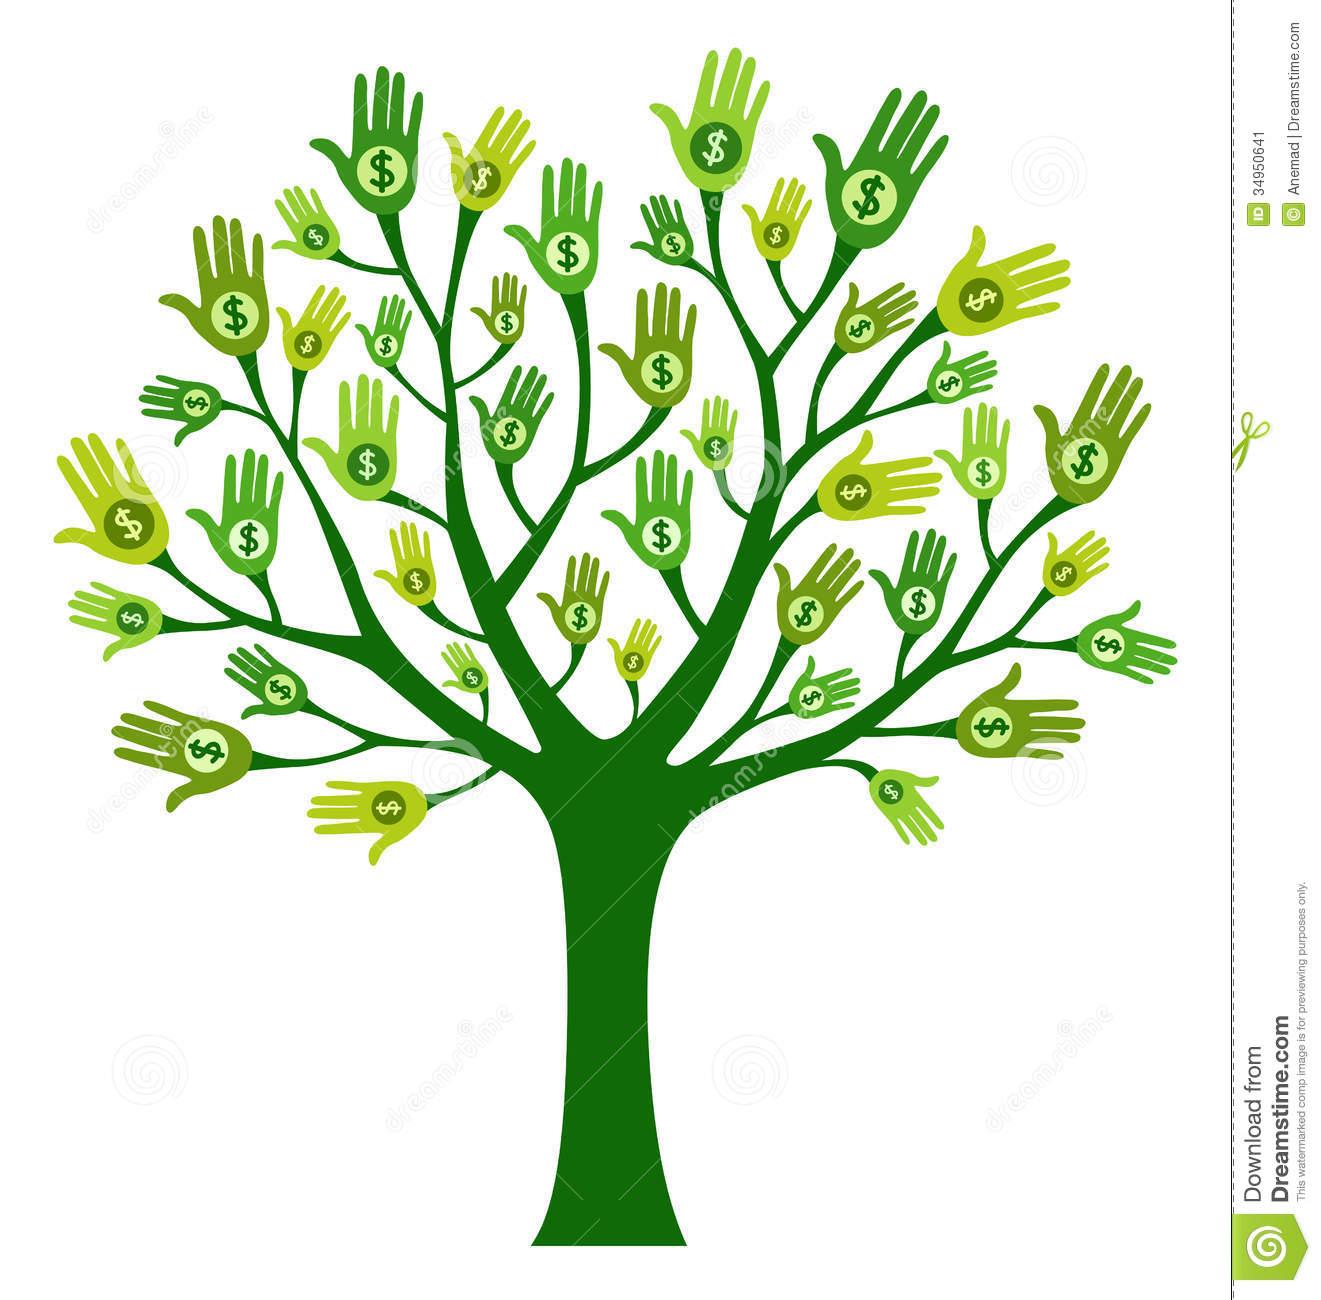 money tree stock image clipart panda free clipart images rh clipartpanda com money tree clipart free Animated Money Tree